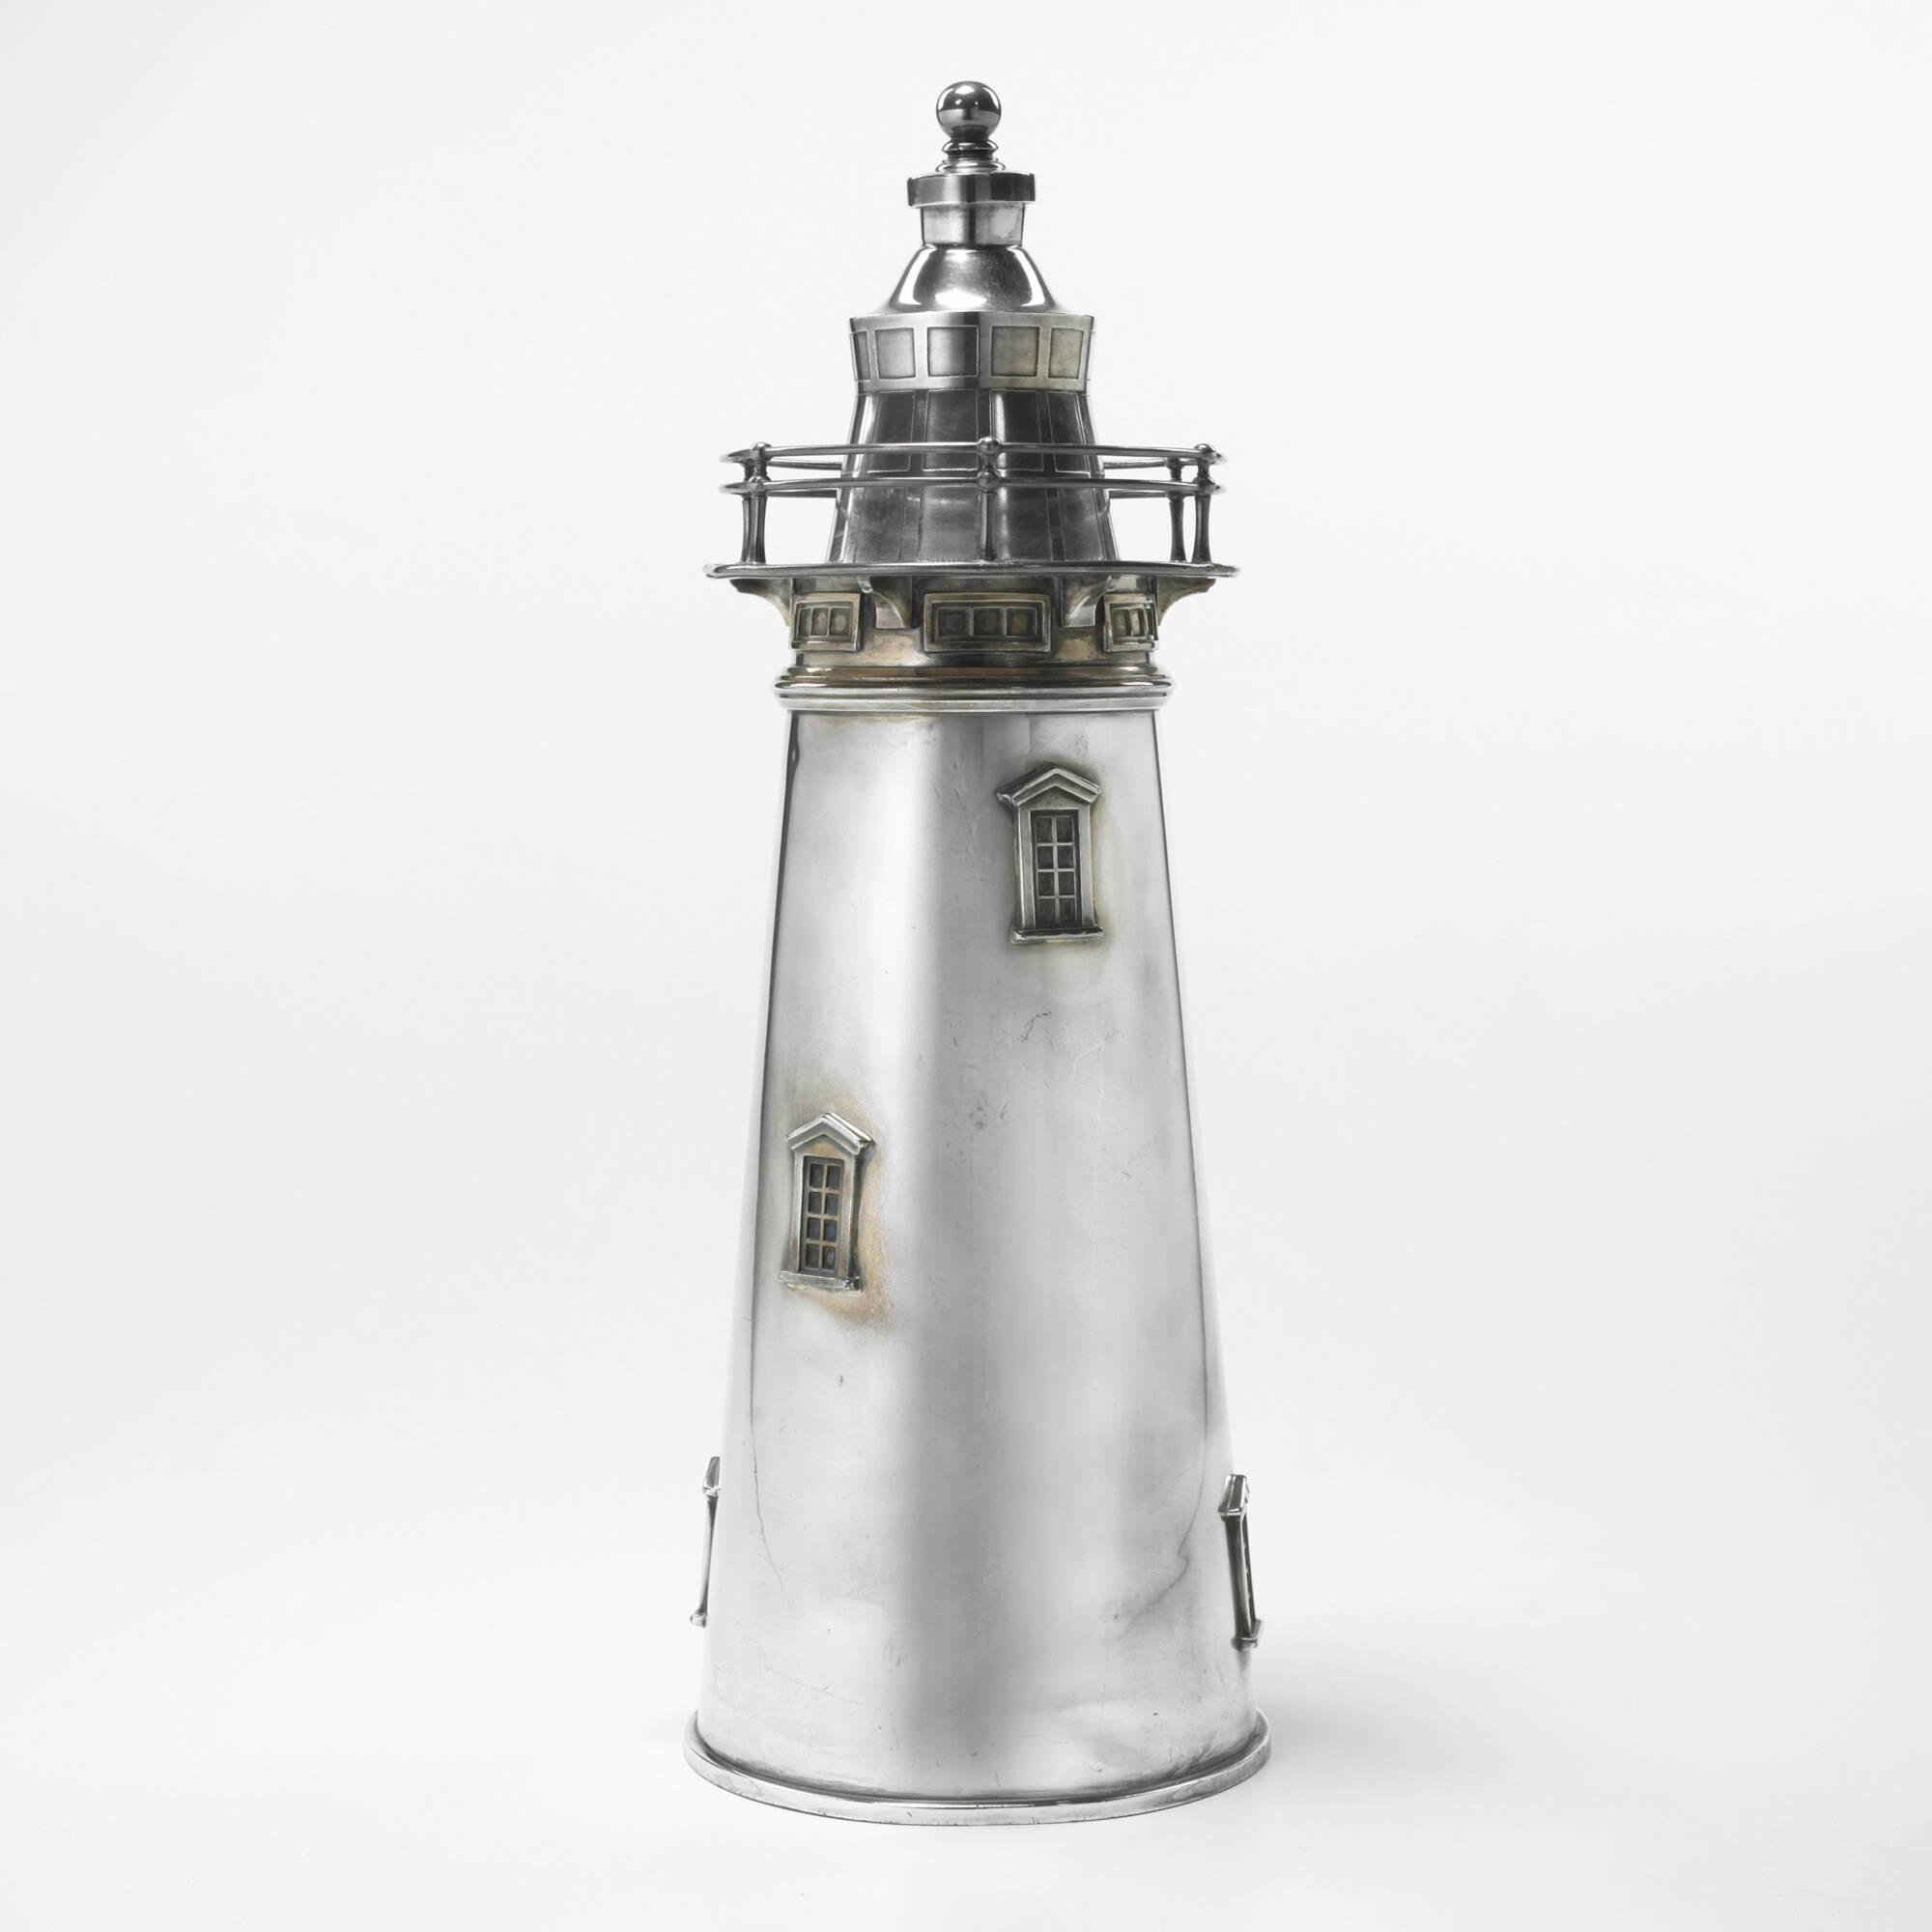 416: INTERNATIONAL SILVER COMPANY, Lighthouse cocktail